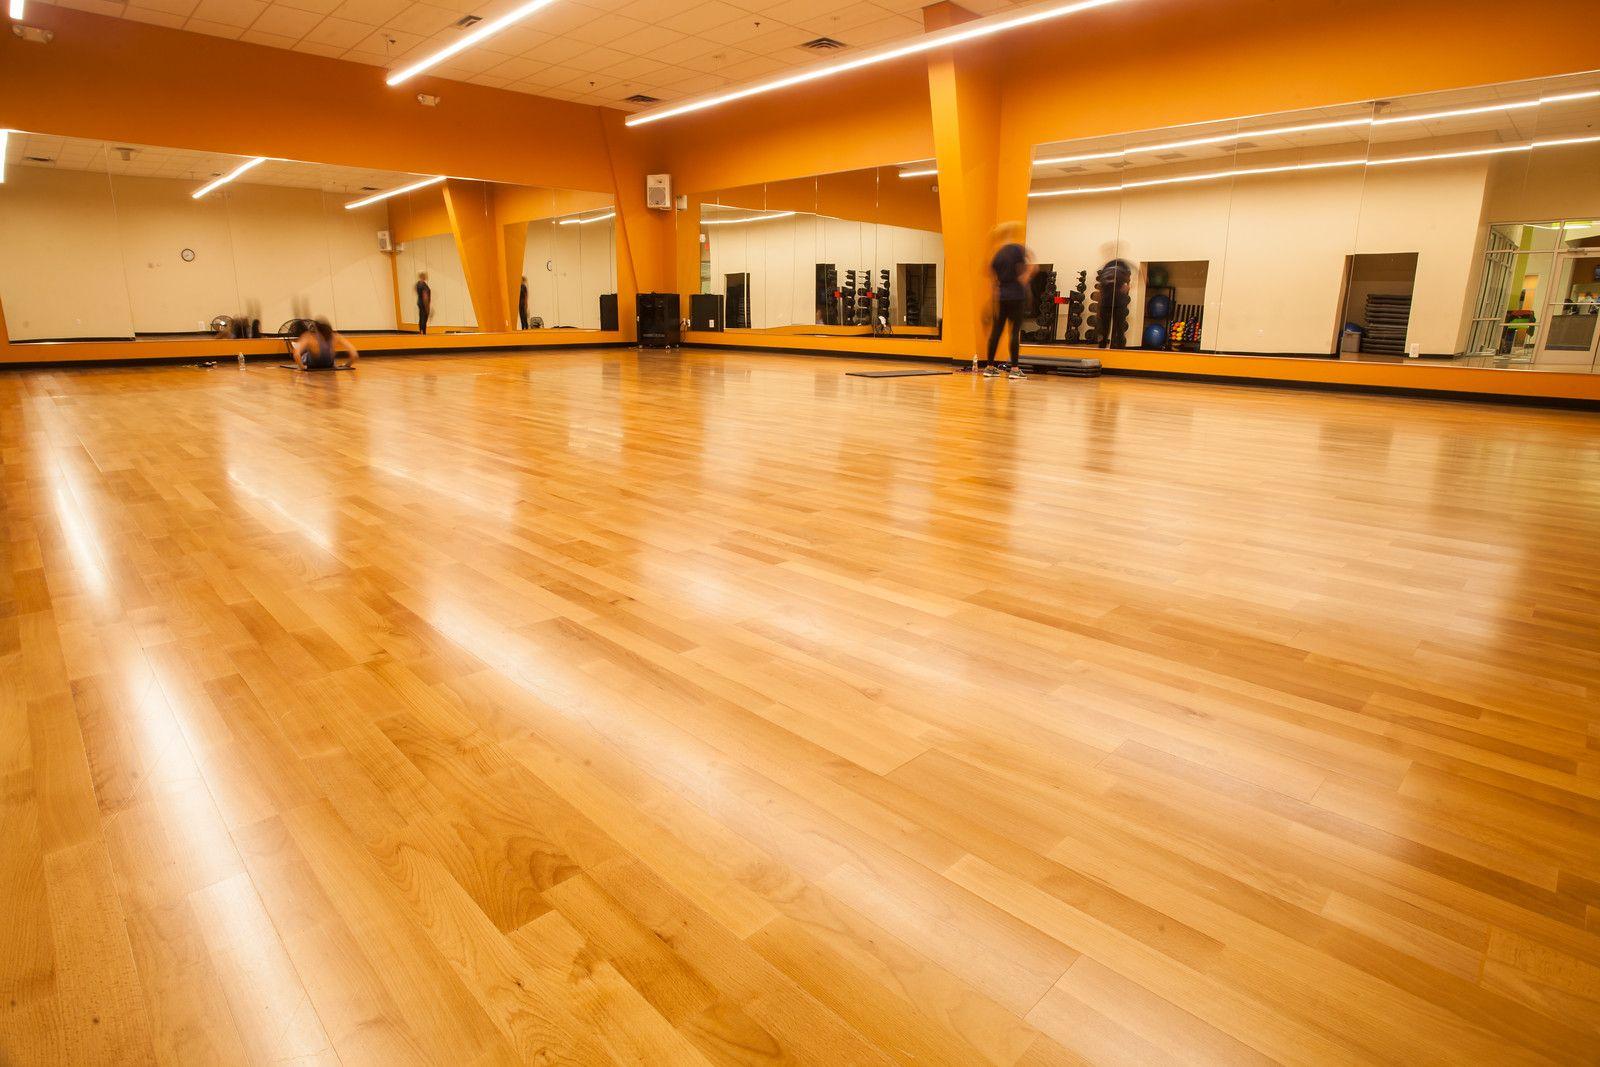 Our Hardwoodflooring Installed For Meridian Fitness Wellness In Brick Nj Flooredbythor Thorperformanceproducts Wellness Design Flooring Floor Workouts